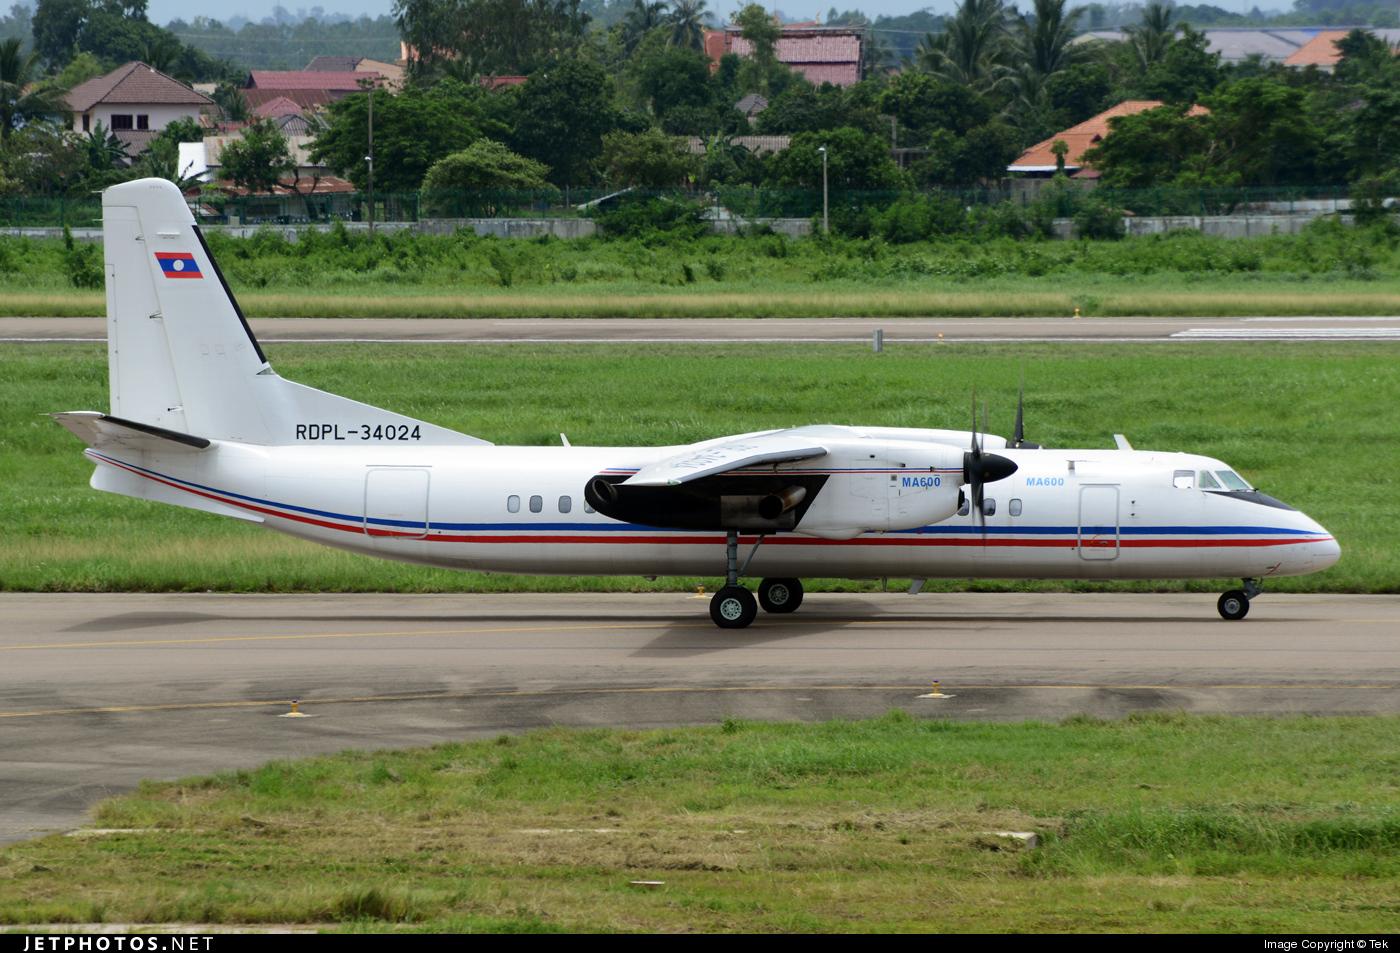 RDPL-34024 - Xian MA-600 - Laos - Air Force